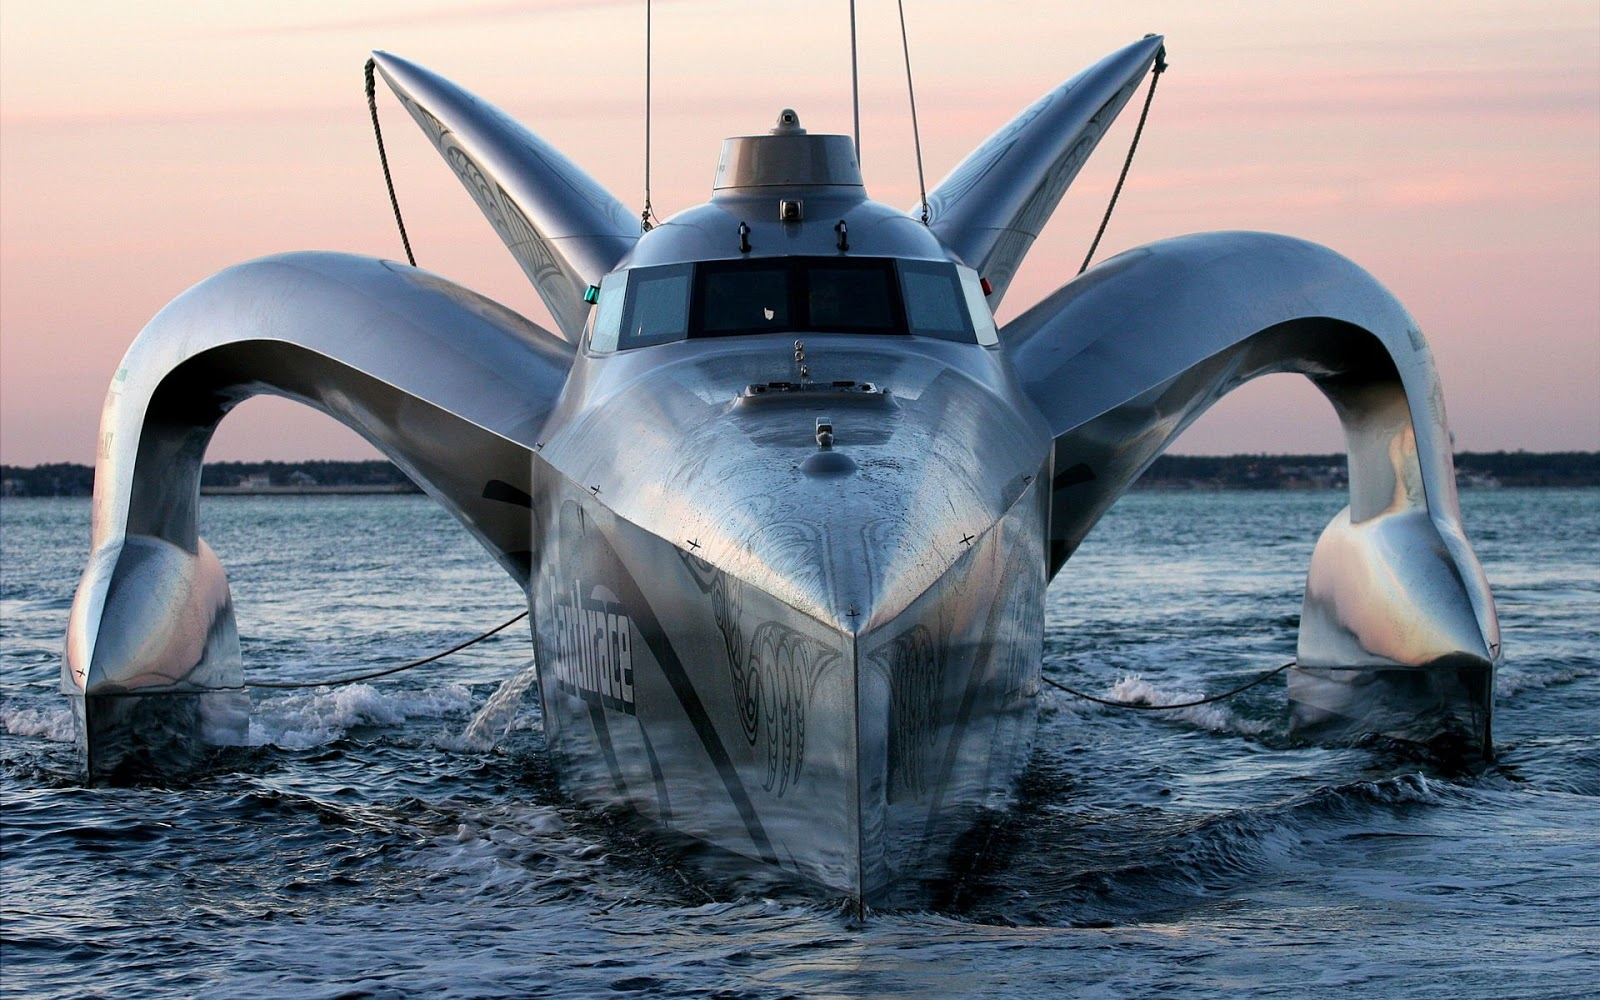 http://4.bp.blogspot.com/-ArUjxHA5Z98/UJawlzYkzjI/AAAAAAAAA_A/iBRQFuV9PaM/s1600/HighTech_Stealth_Yacht_EARTHRACE.jpg